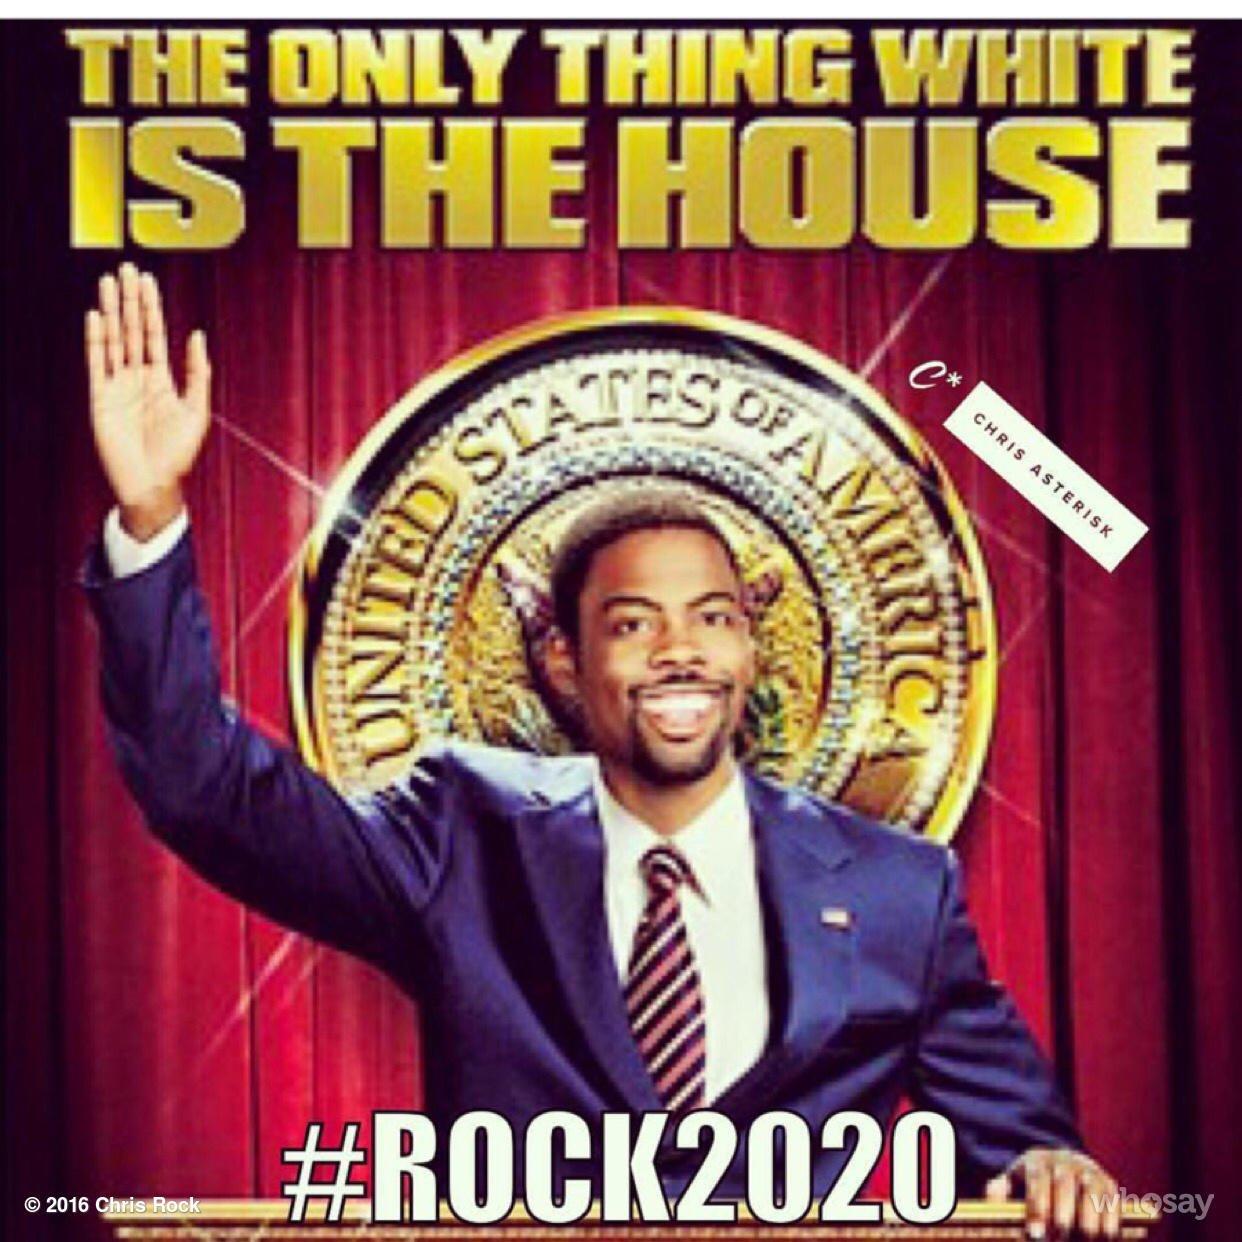 Chris Rock Tour 2020 Chris Rock on Twitter: